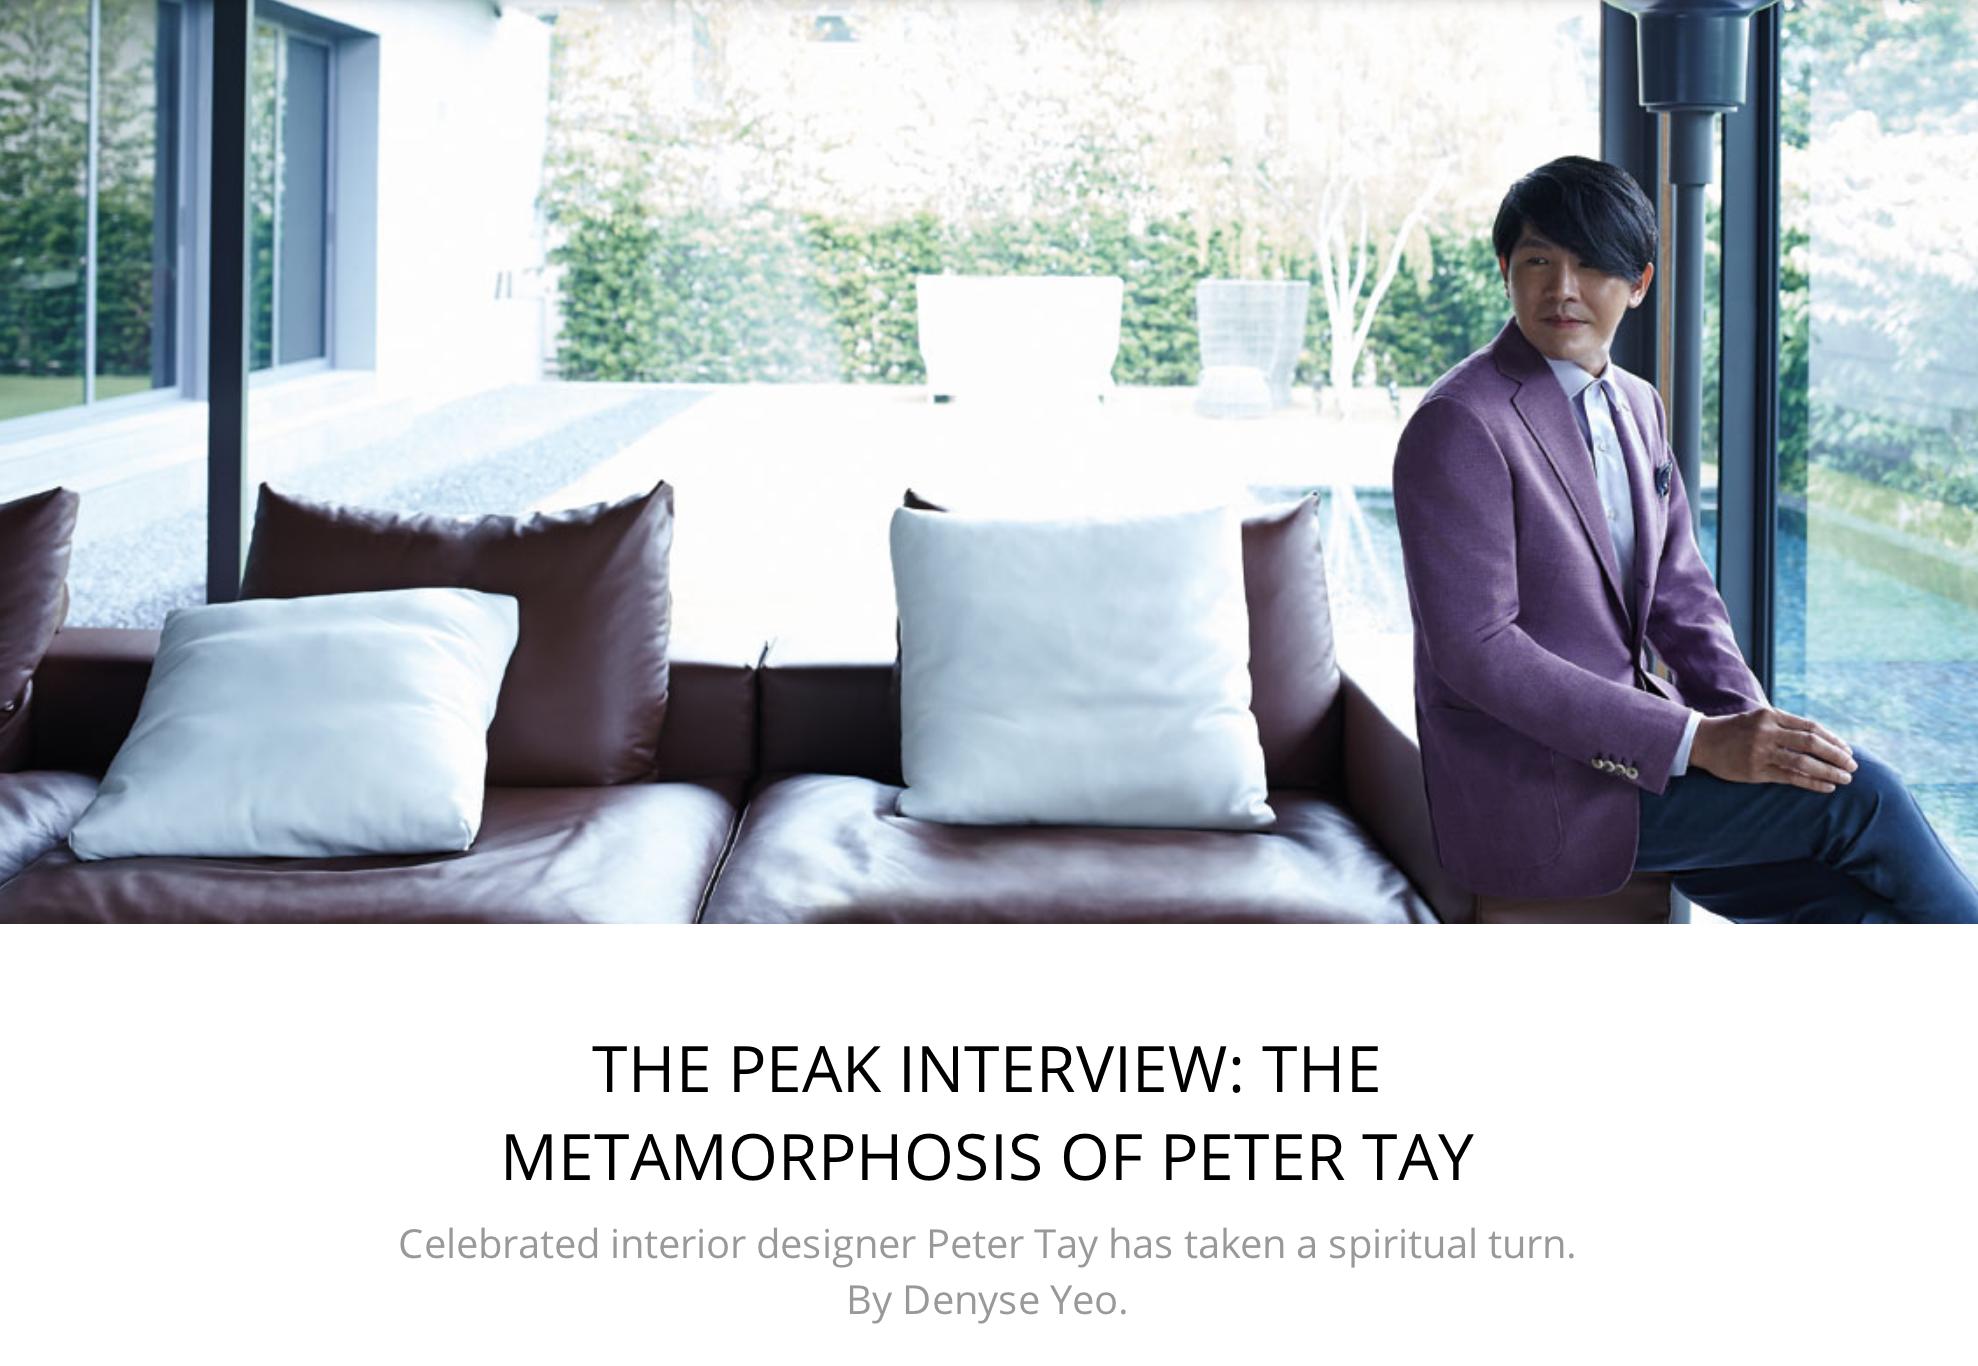 2014, July 2014, The Peak magazine